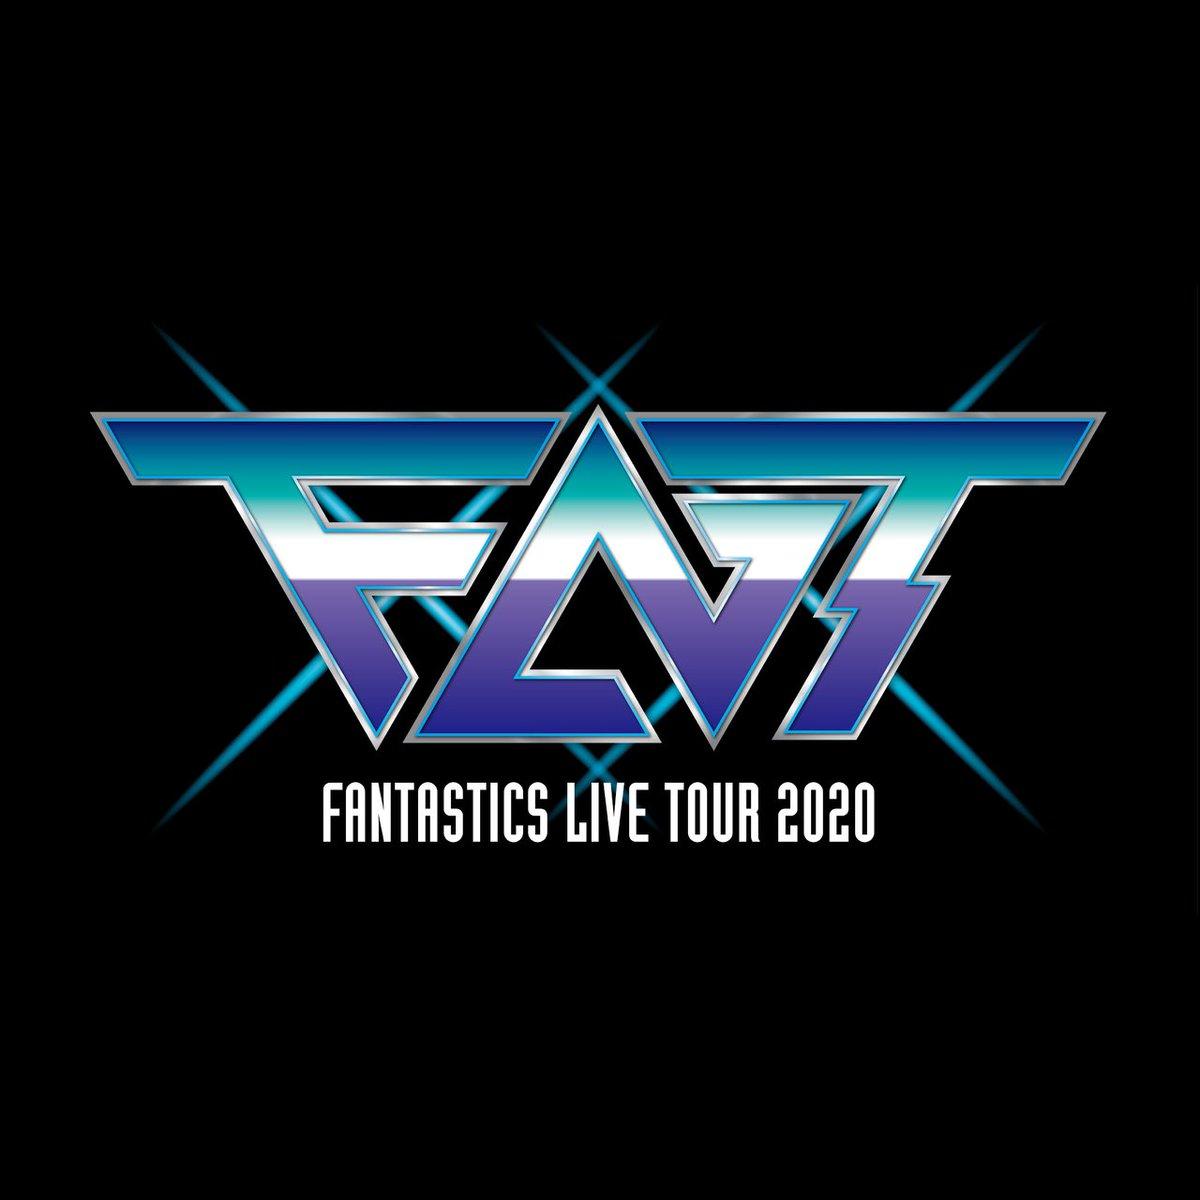 LDH PERFECT YEAR 2020SEASON2 IMAGINATIONFANTASTICS LIVE TOUR 2020